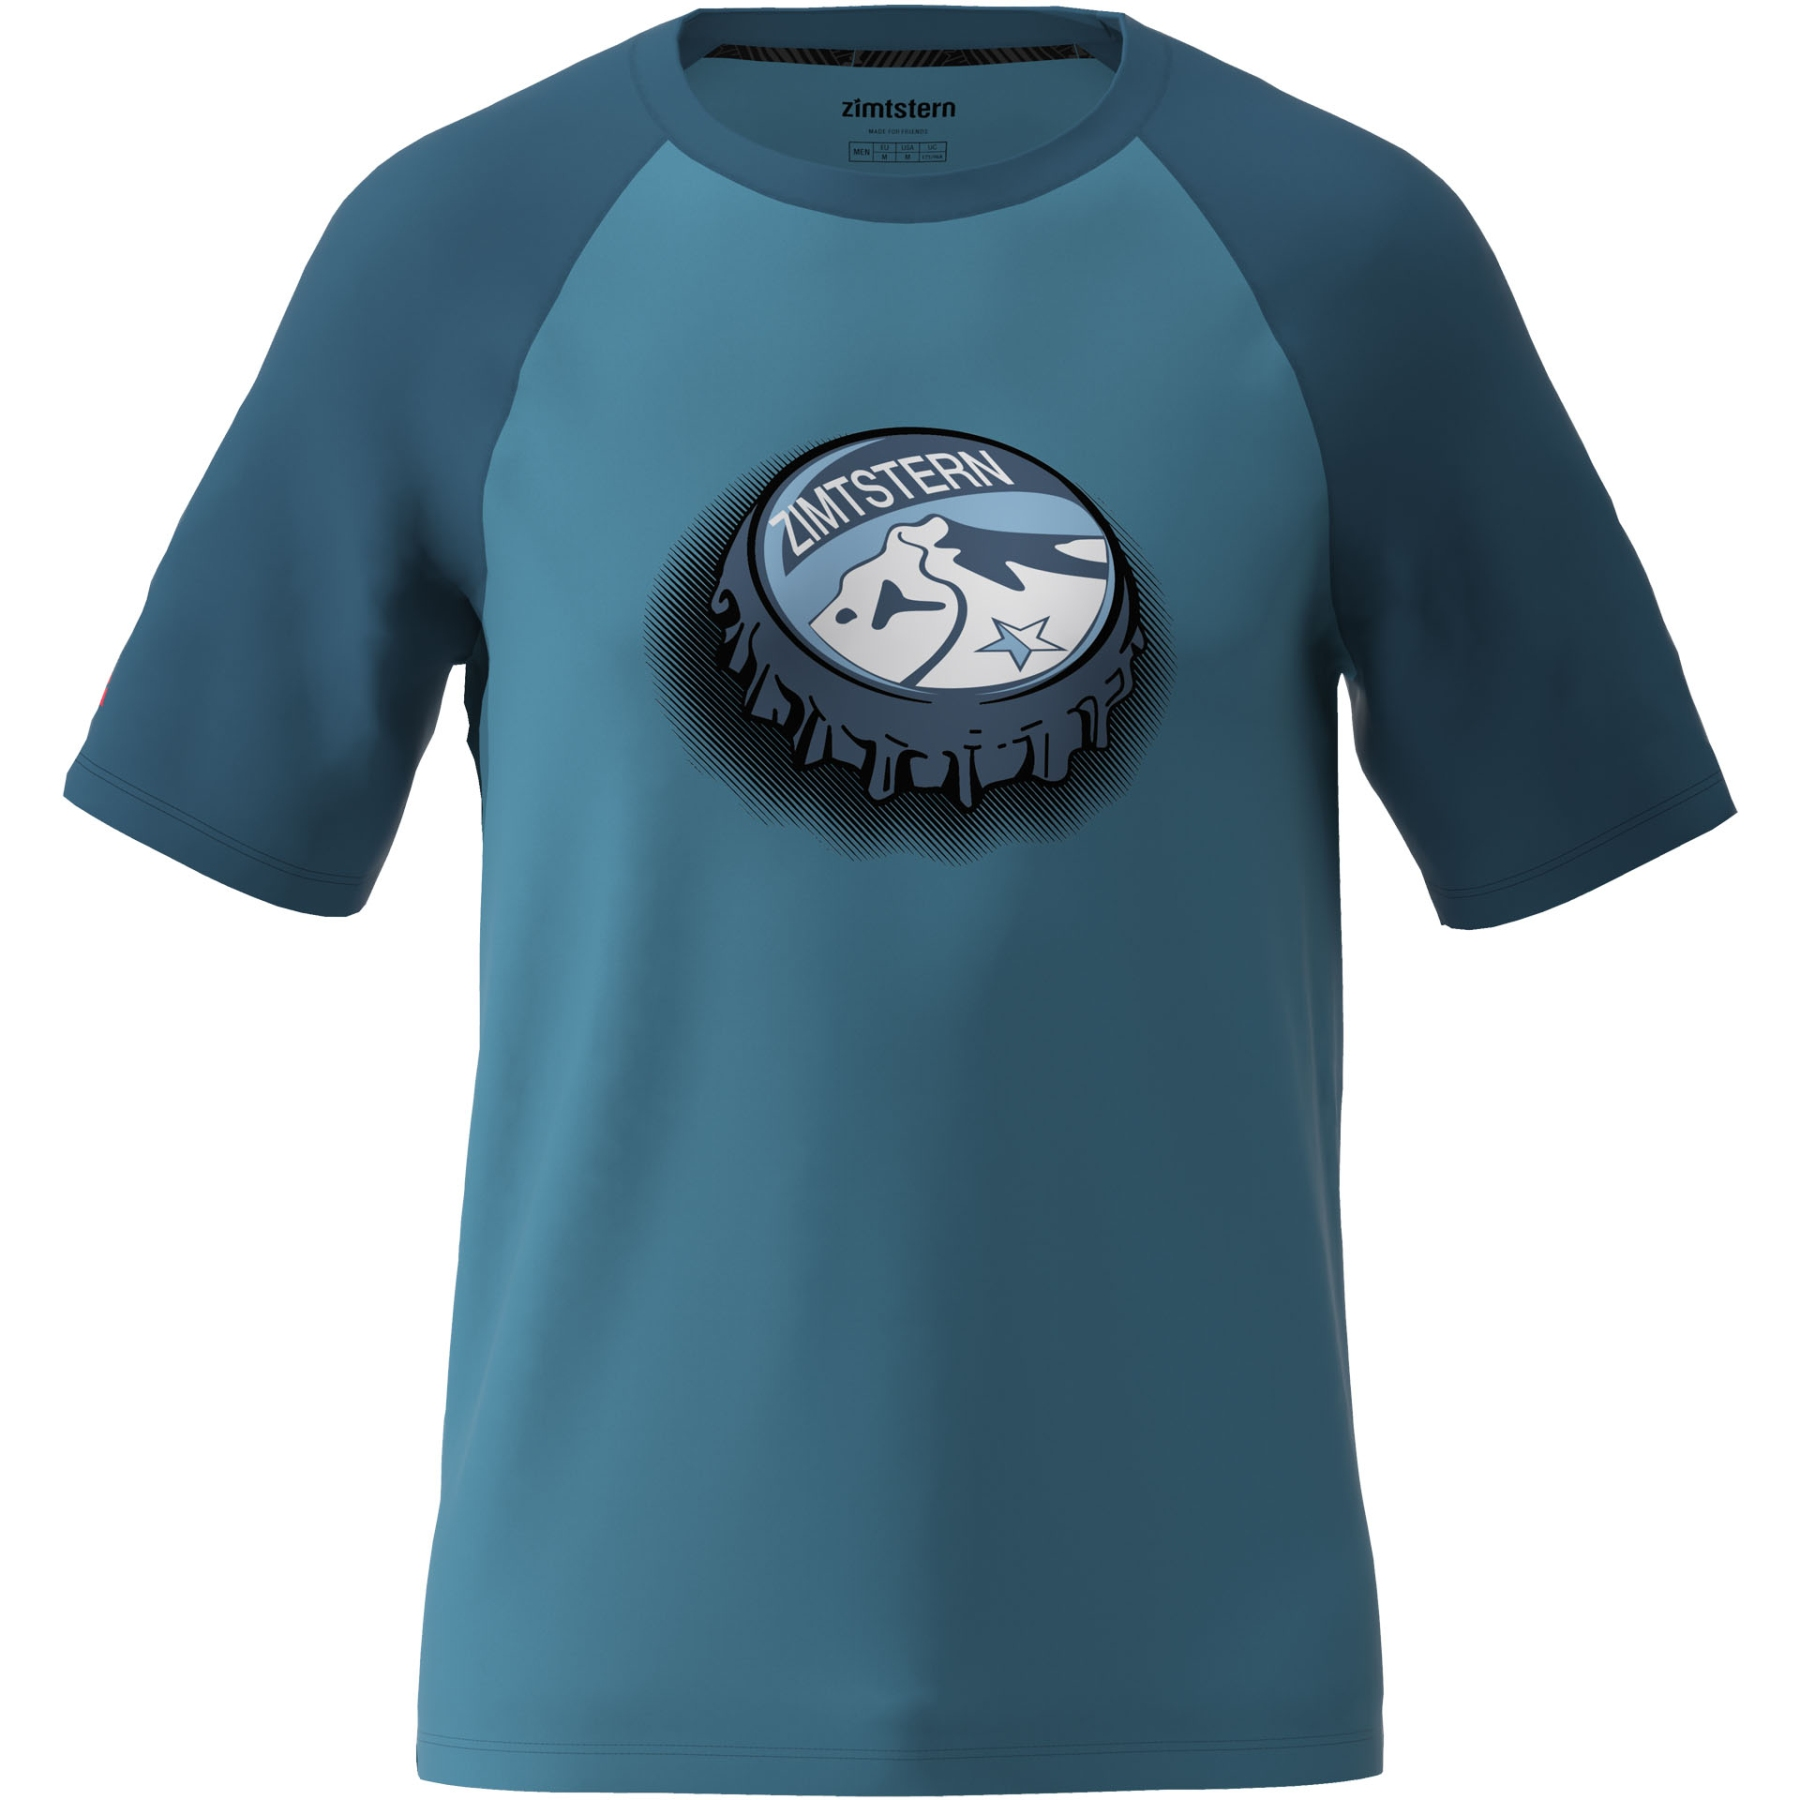 Zimtstern Cupz T-Shirt - blue steel/french navy